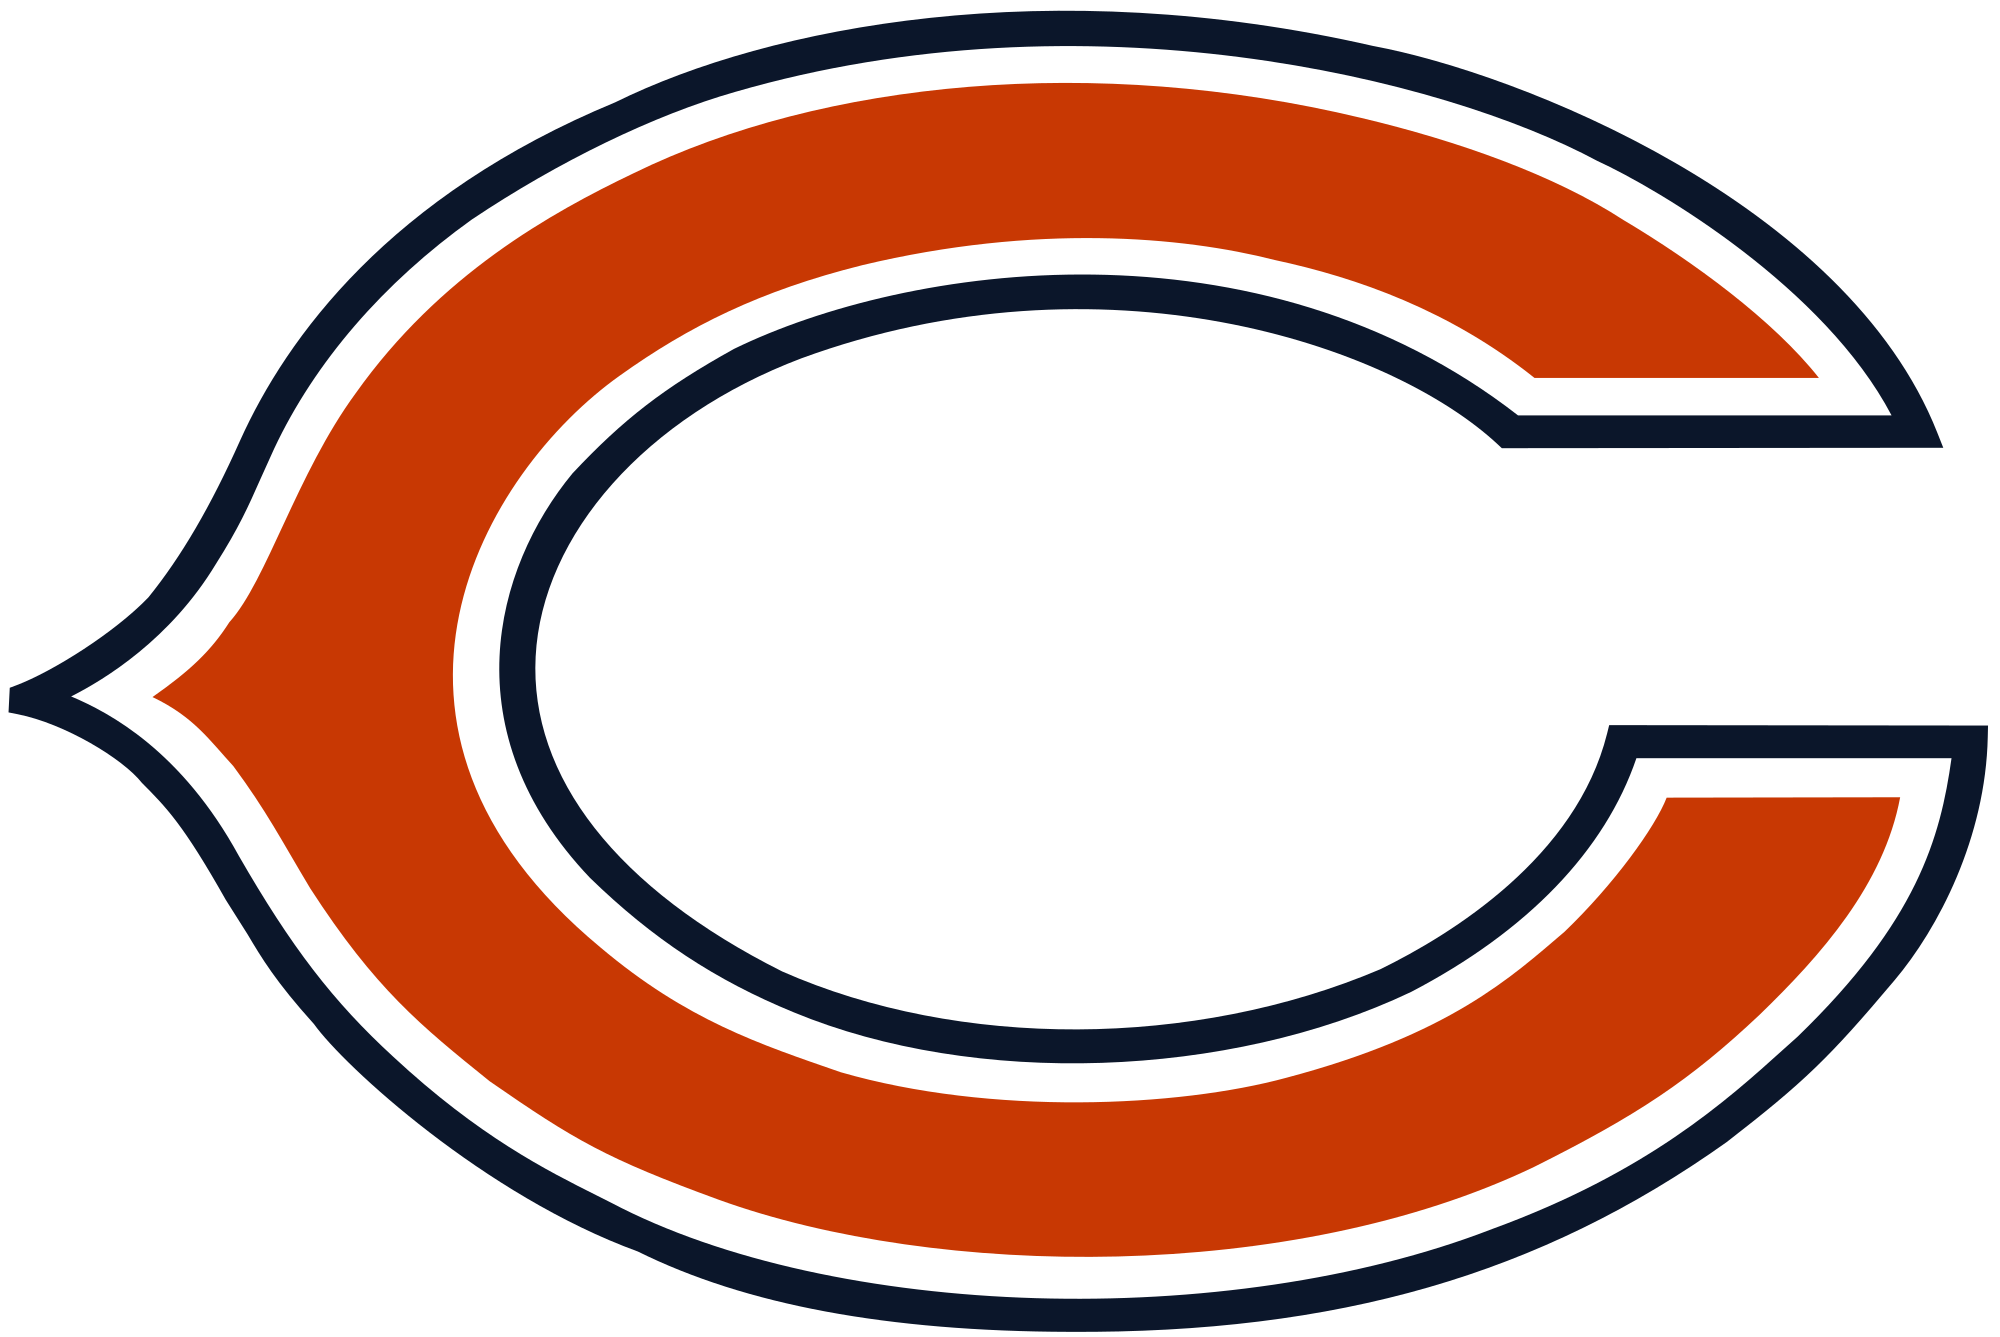 2000x1337 Filechicago Bears Logo.svg